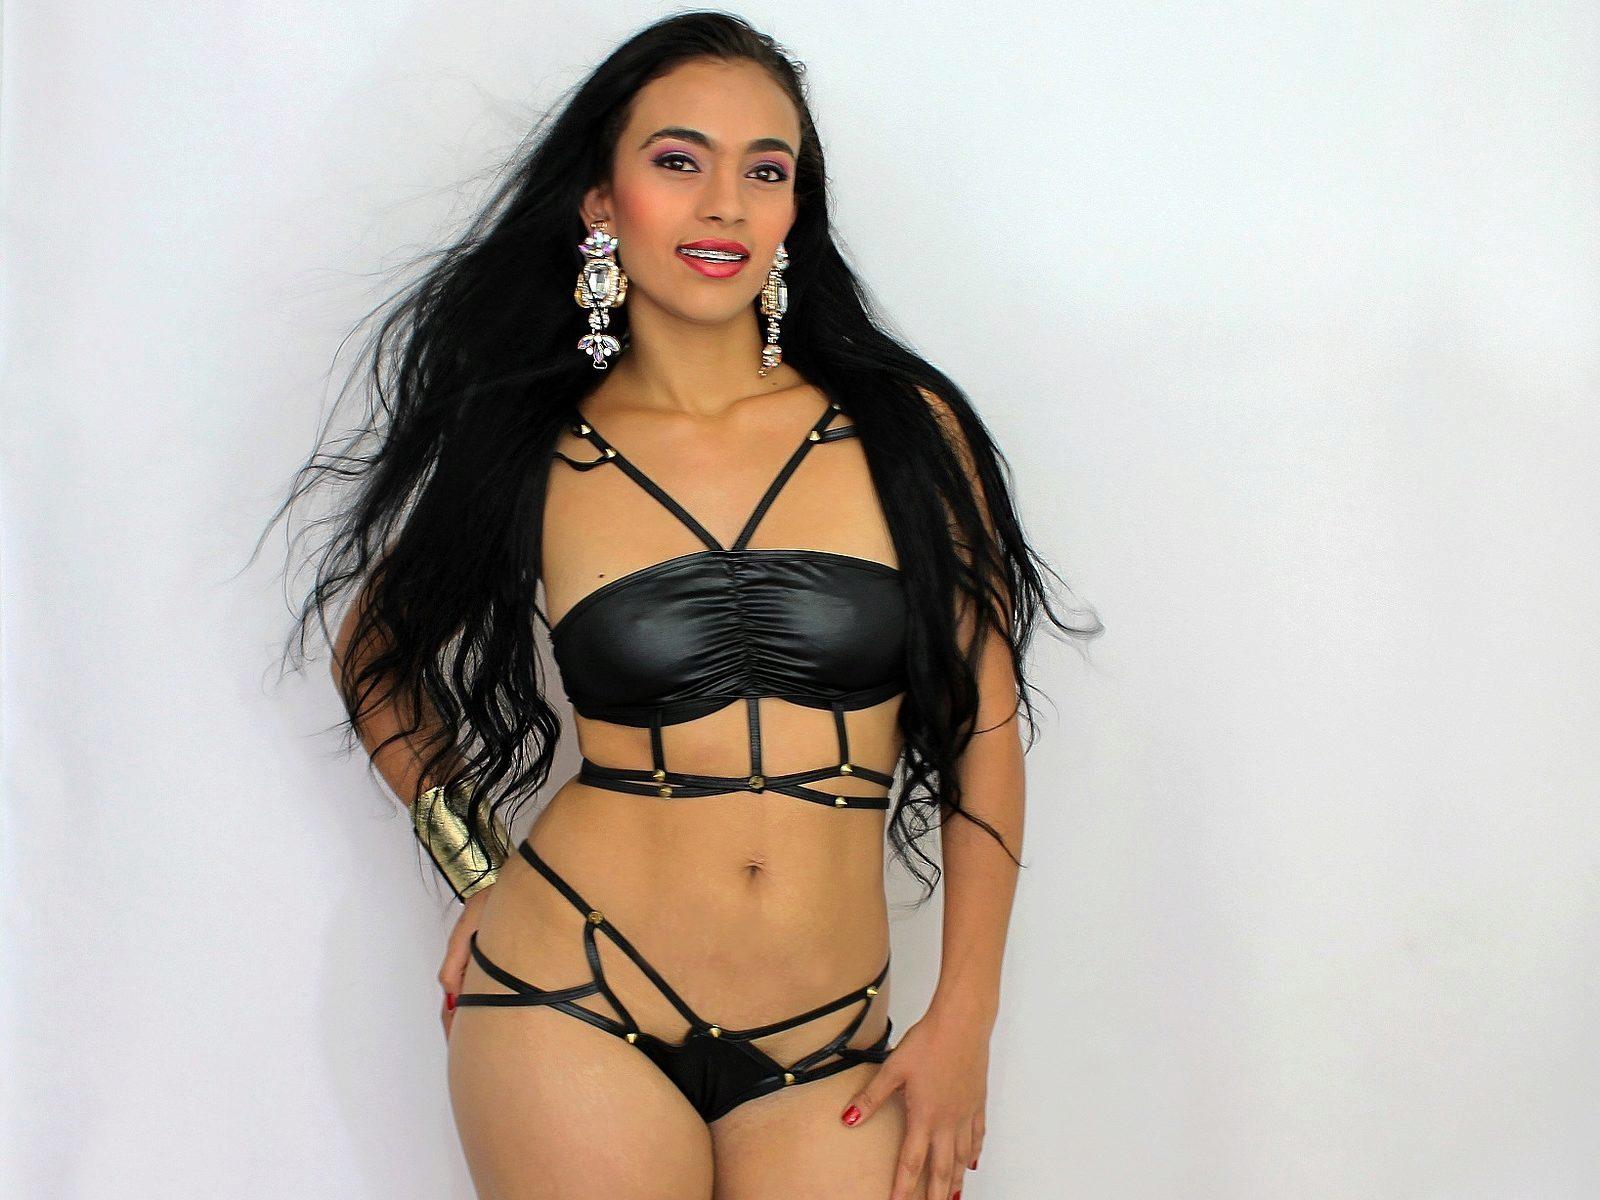 AngelineB